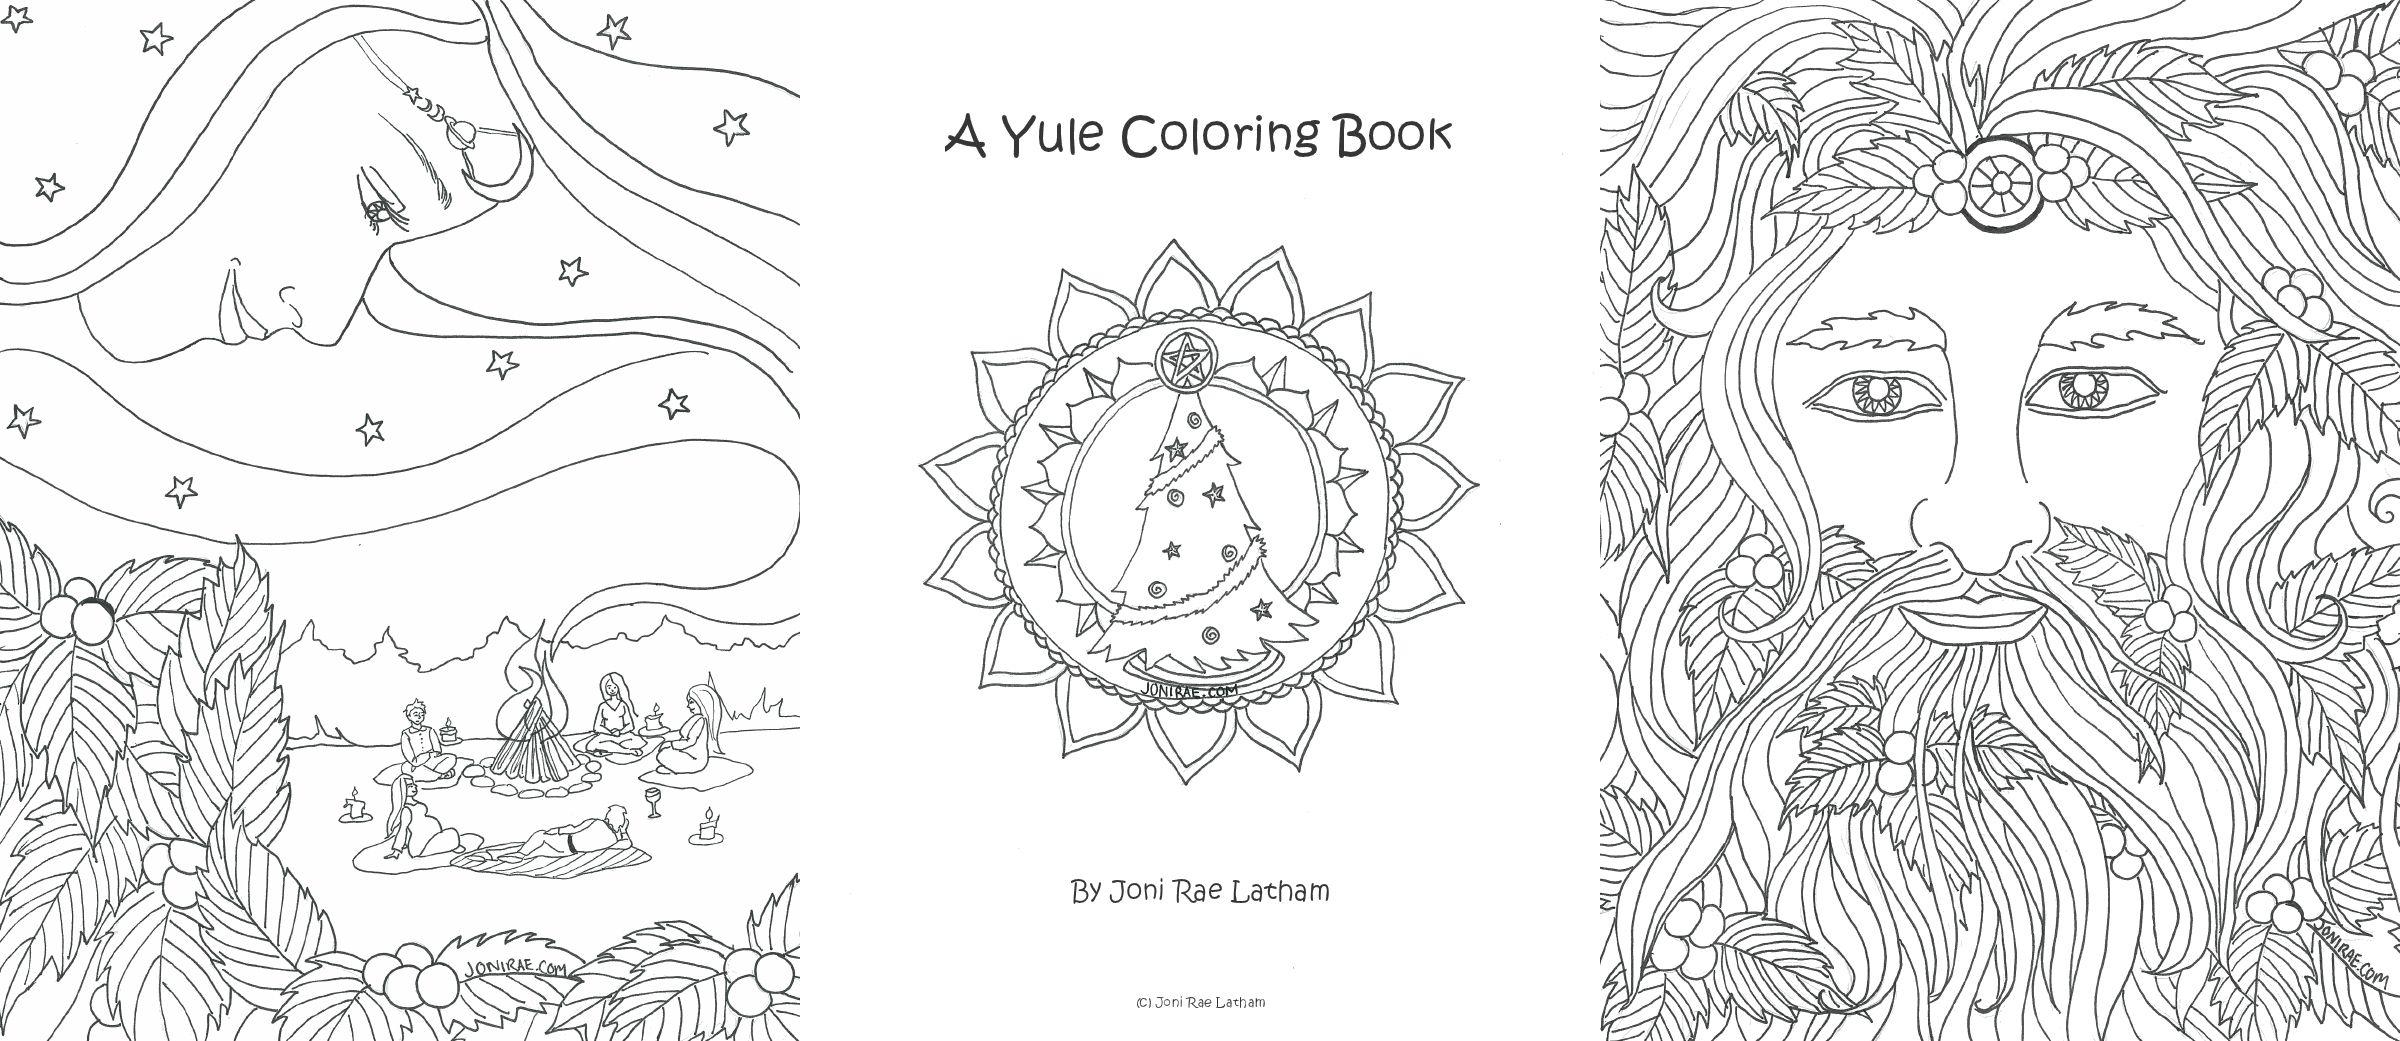 Yulecoloringbookbar Jpg 2 400 1 041 Pixels Witch Coloring Pages Coloring Books Coloring Pages